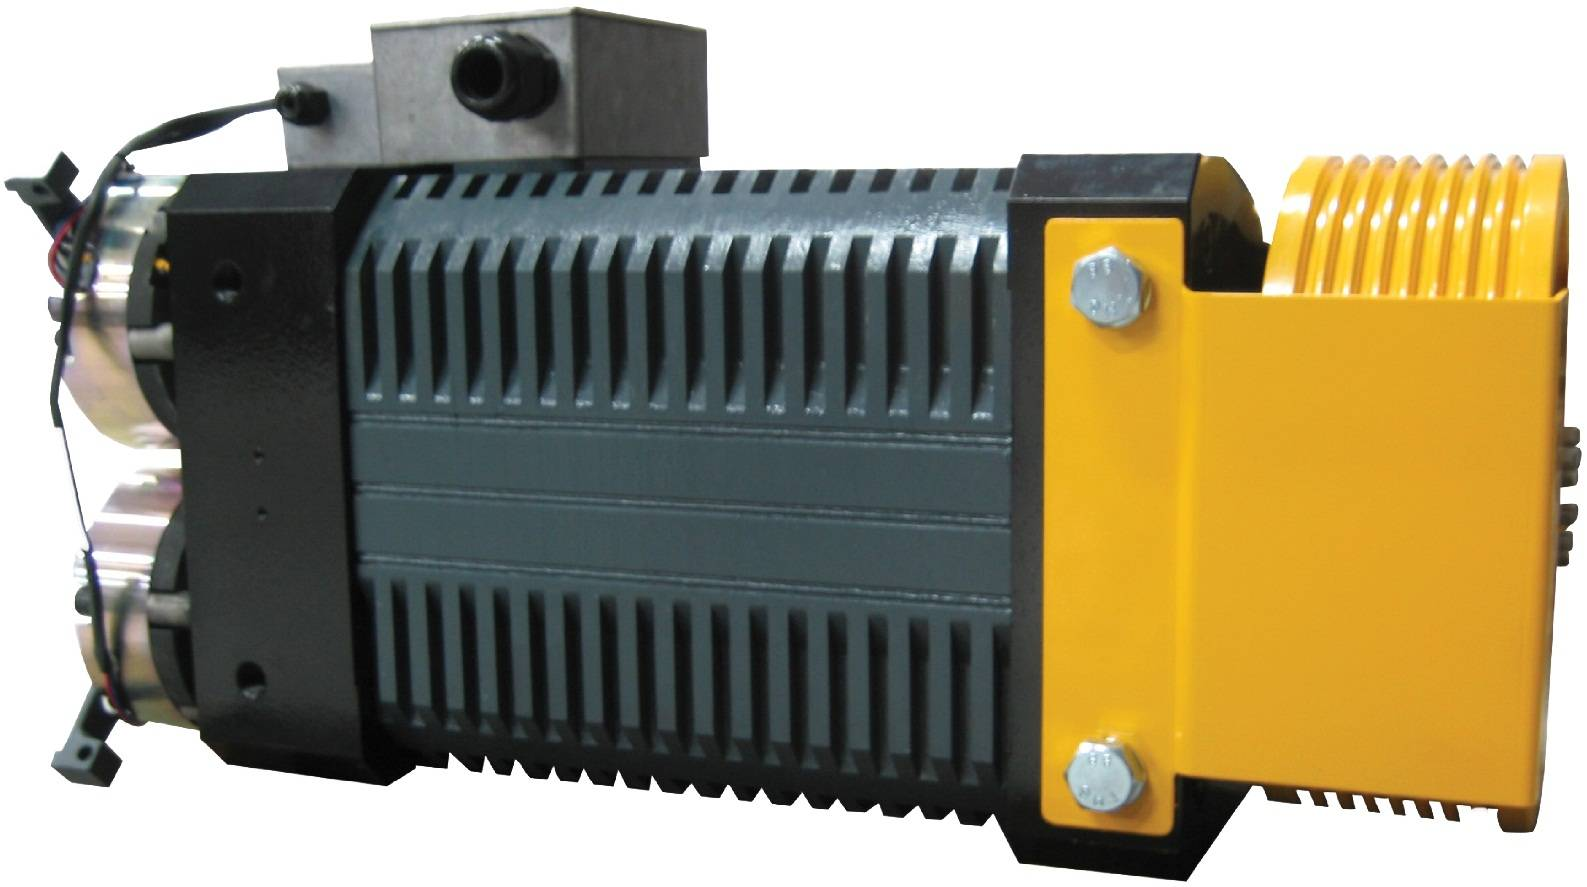 EDAM CS350 Elevator Gearless Traction Machine